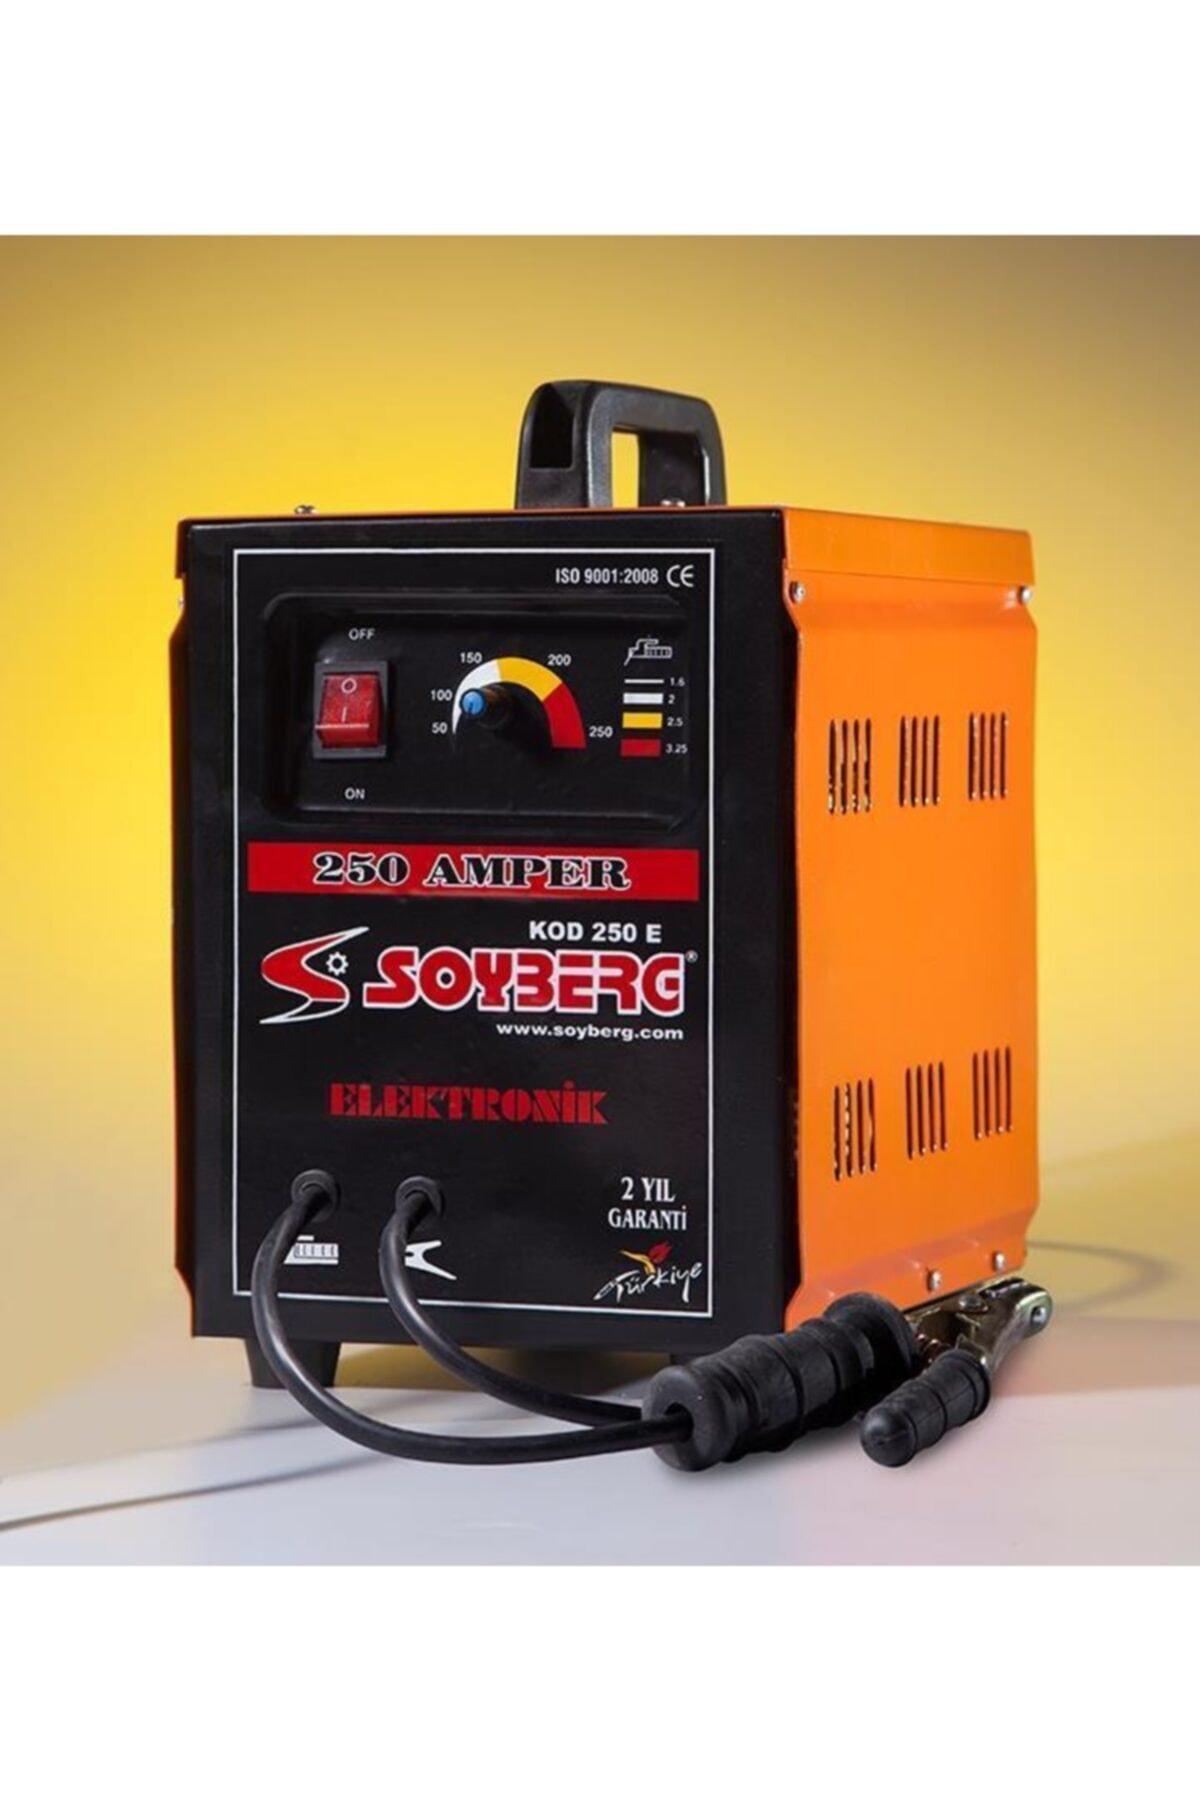 Soyberg 250 E Çanta Kaynak Makinası 250 Amper 1